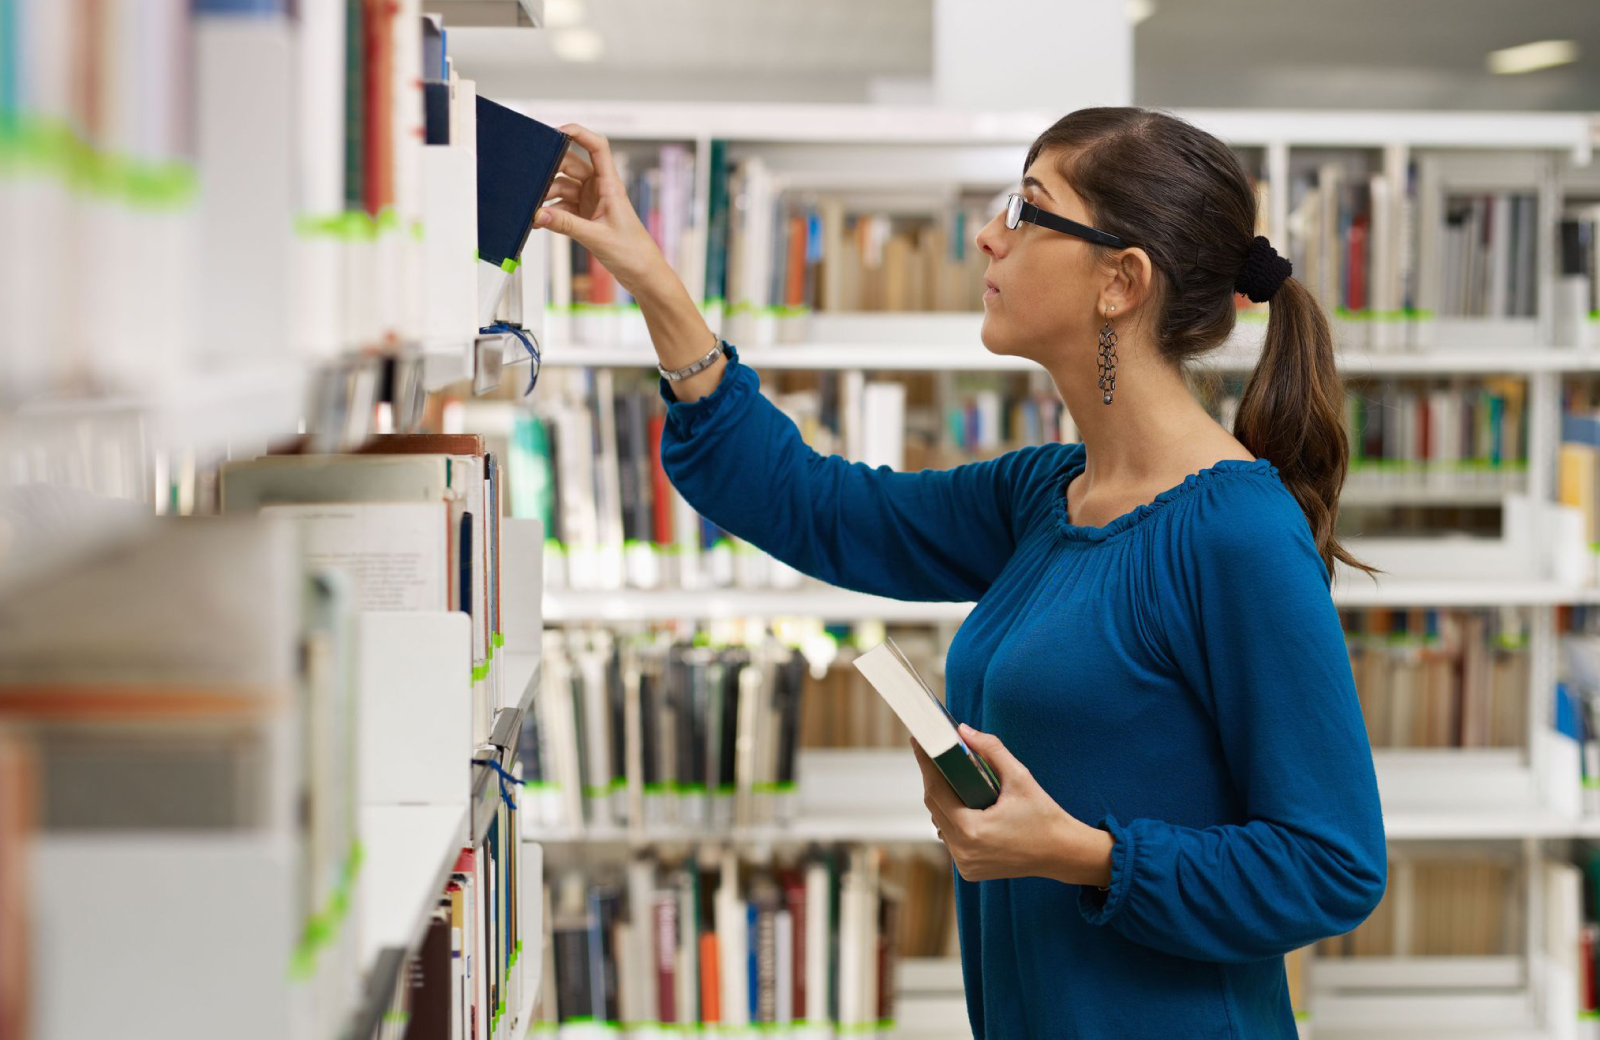 Glendale Library - Altana Apts